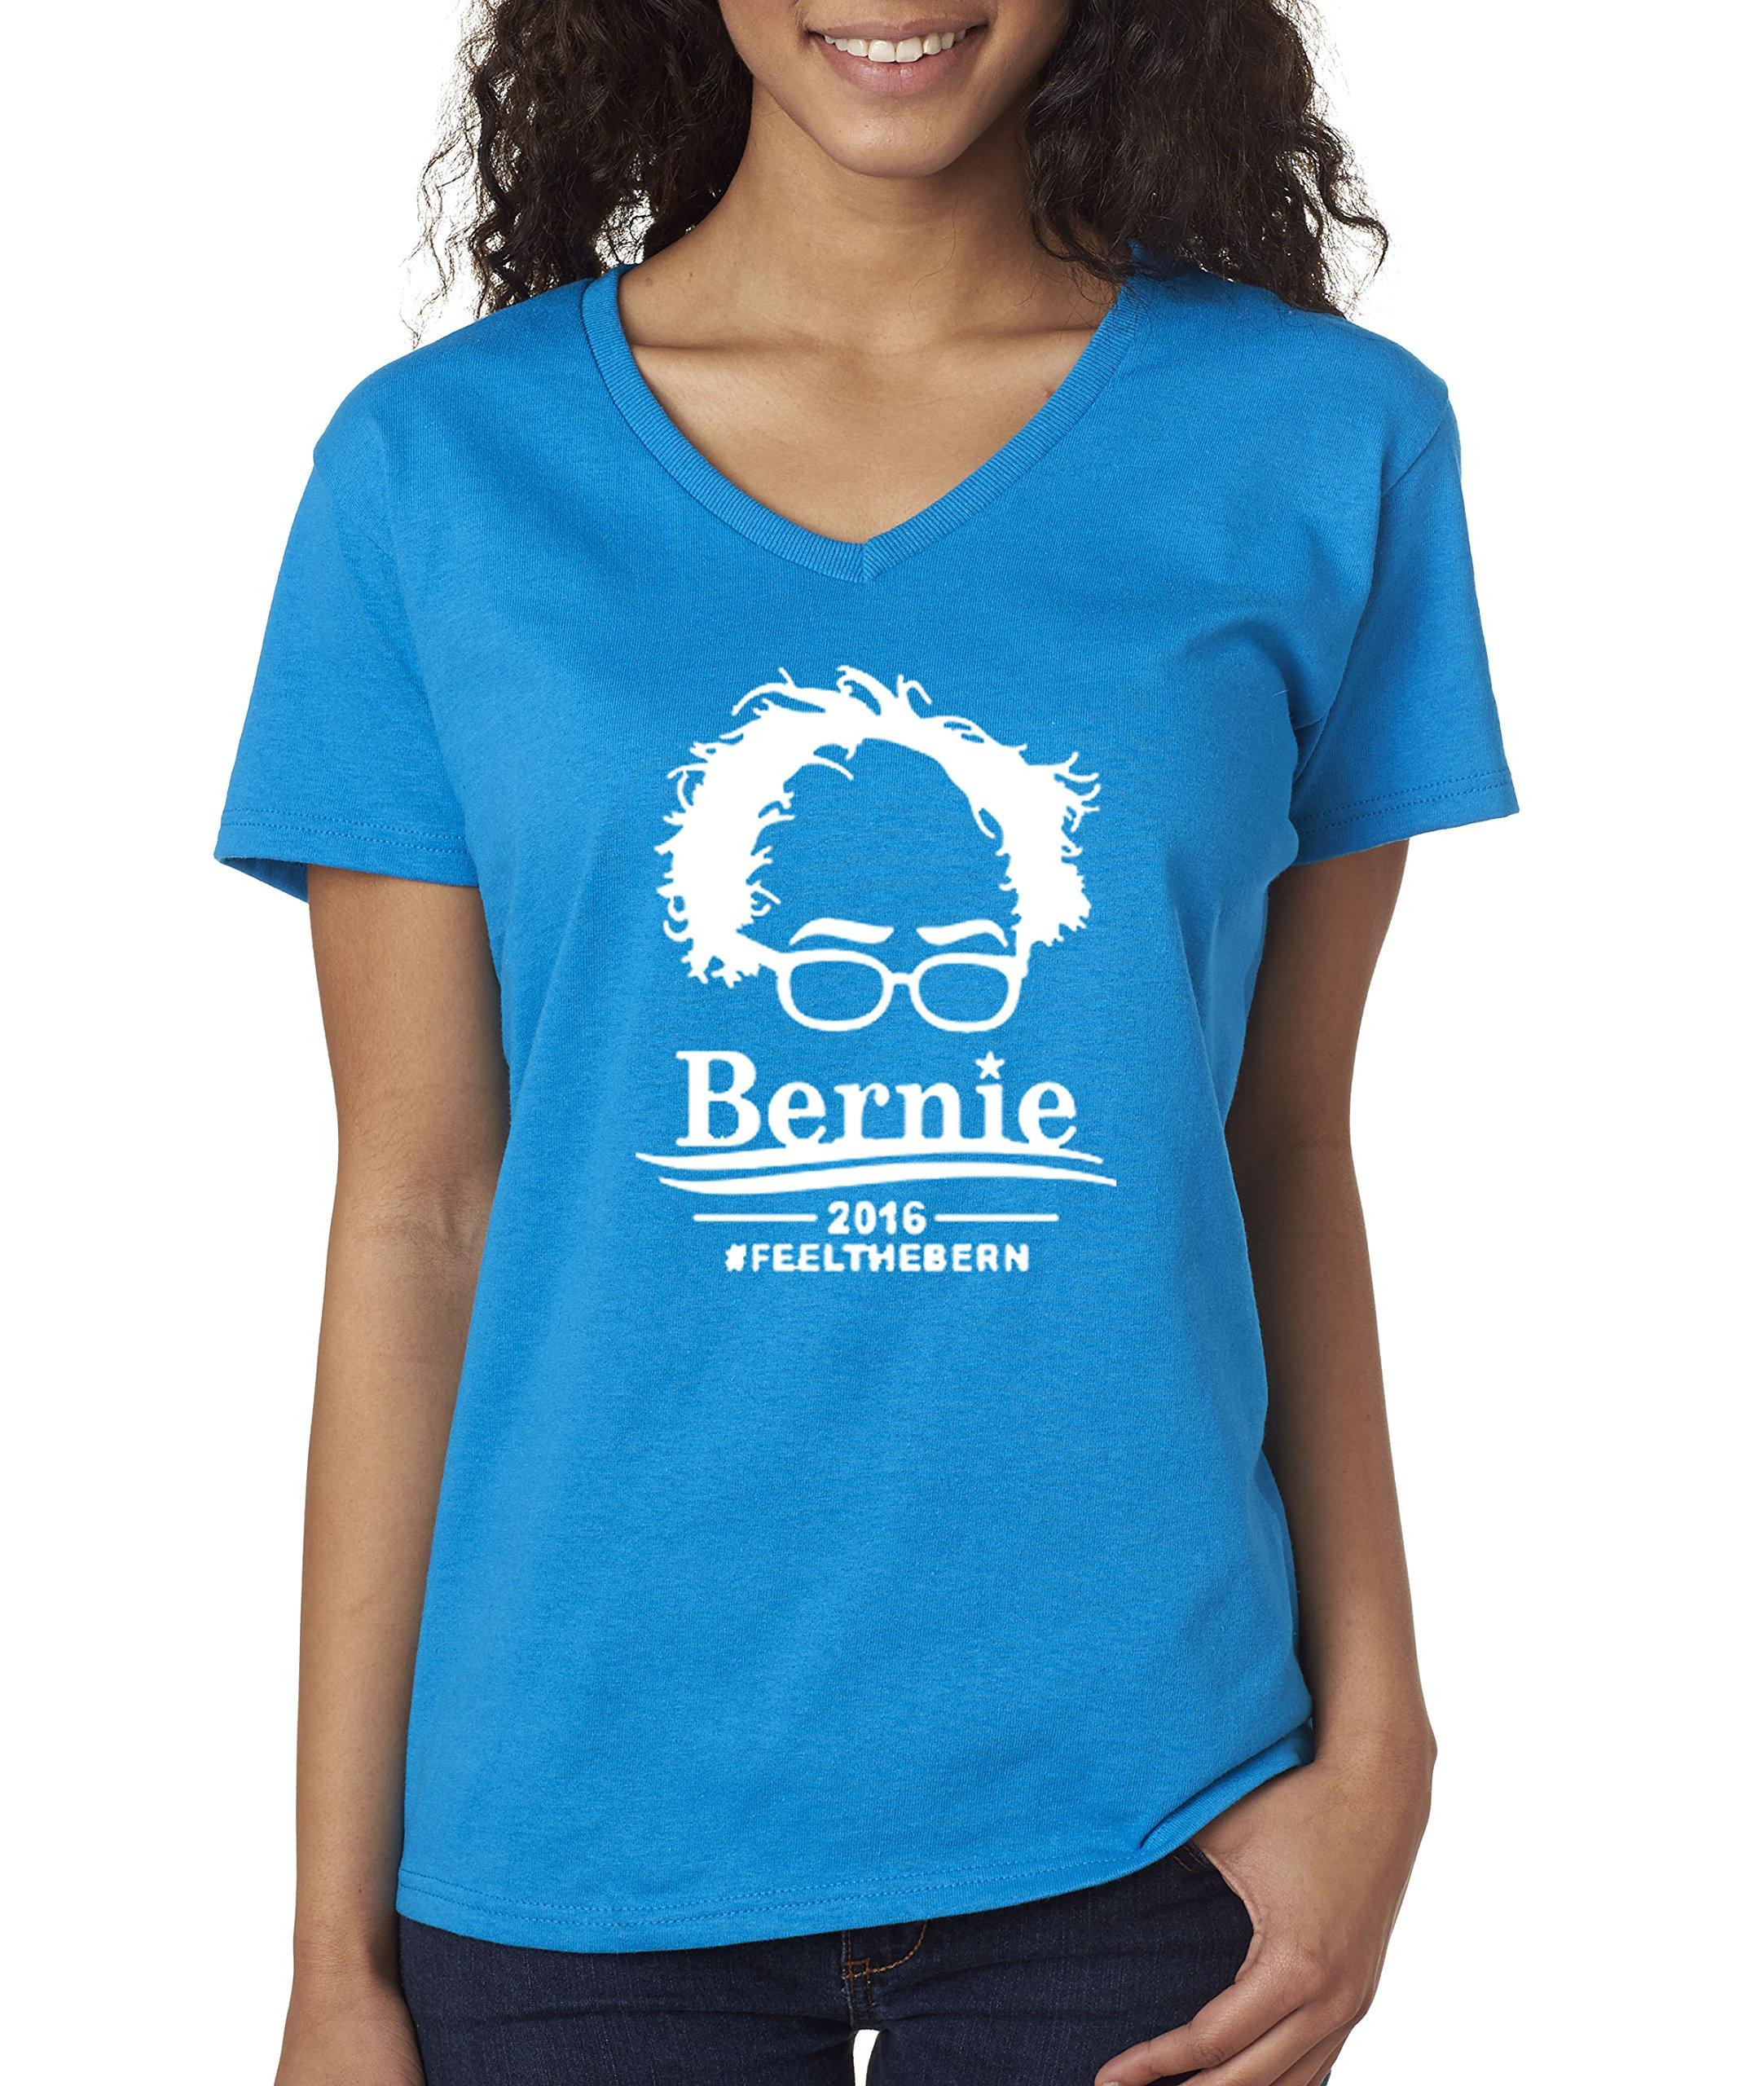 421 T Shirt Bernie Sanders Feel The Bern President Election 2016 Silhouette 9981